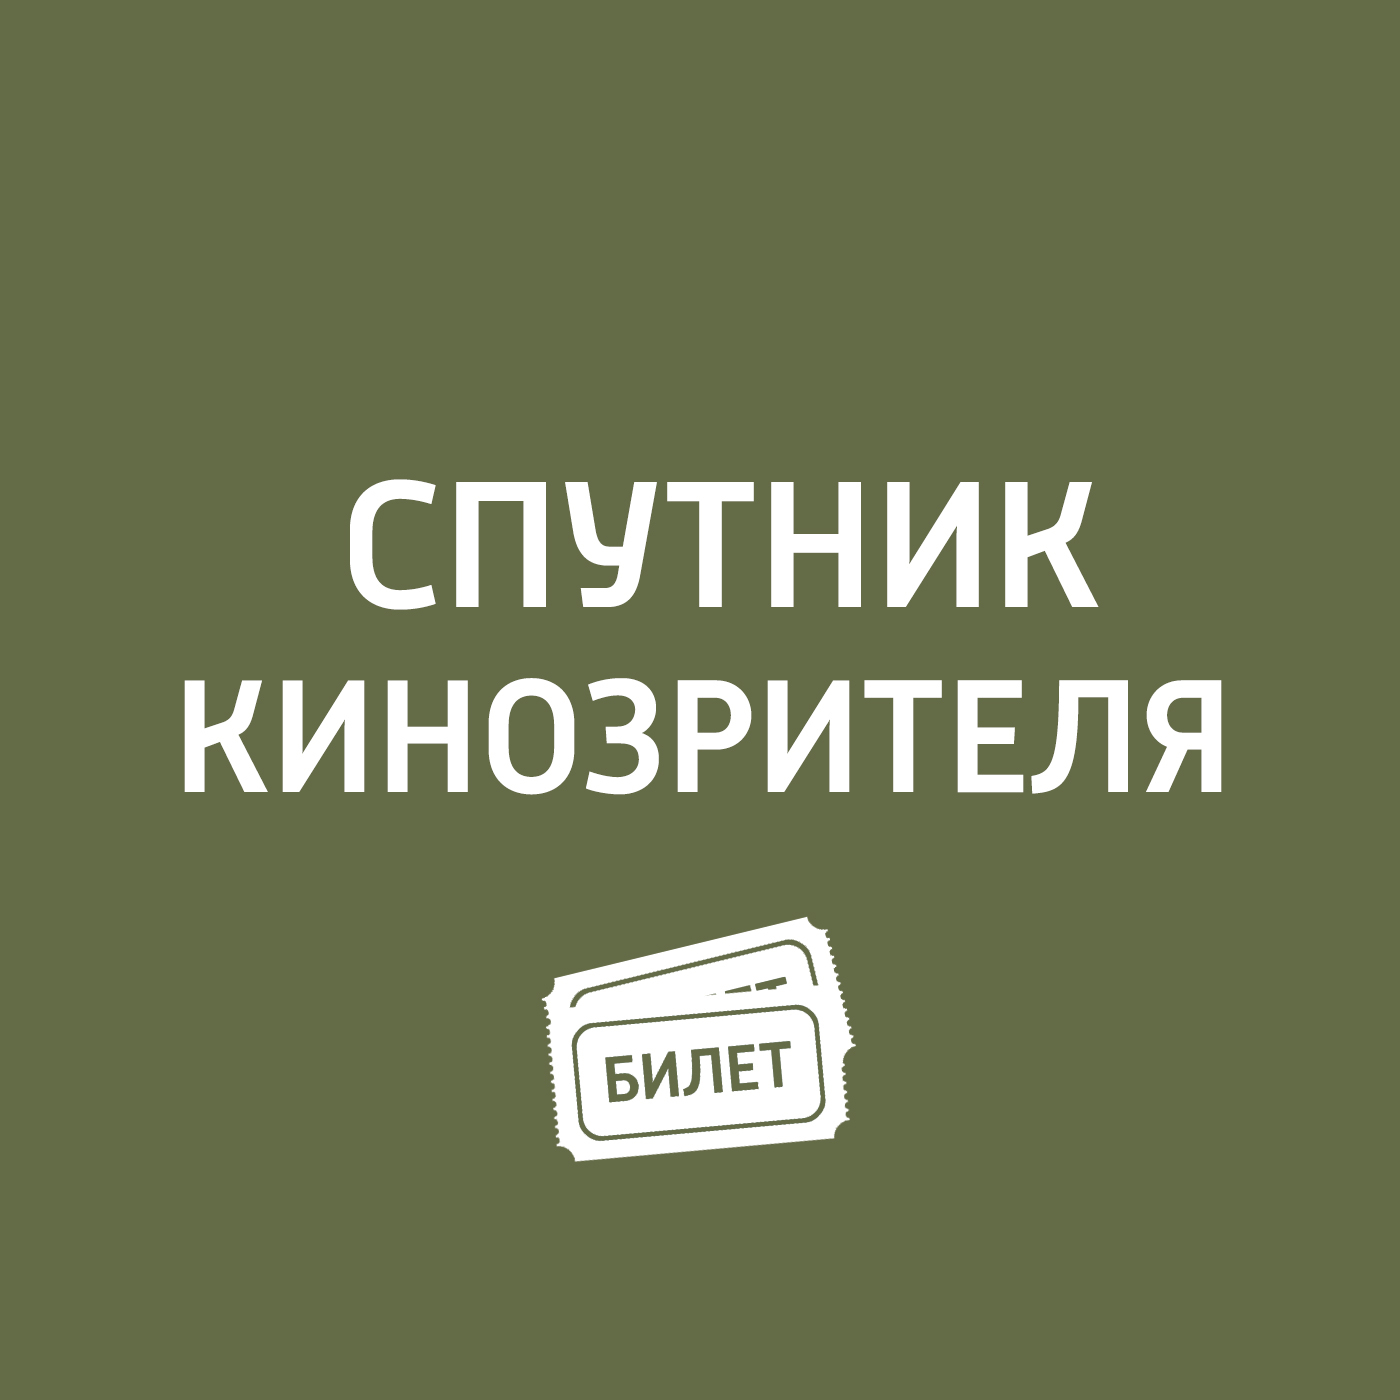 Антон Долин 1812: Уланская баллада, «Операция «Арго ручки parker s1953190